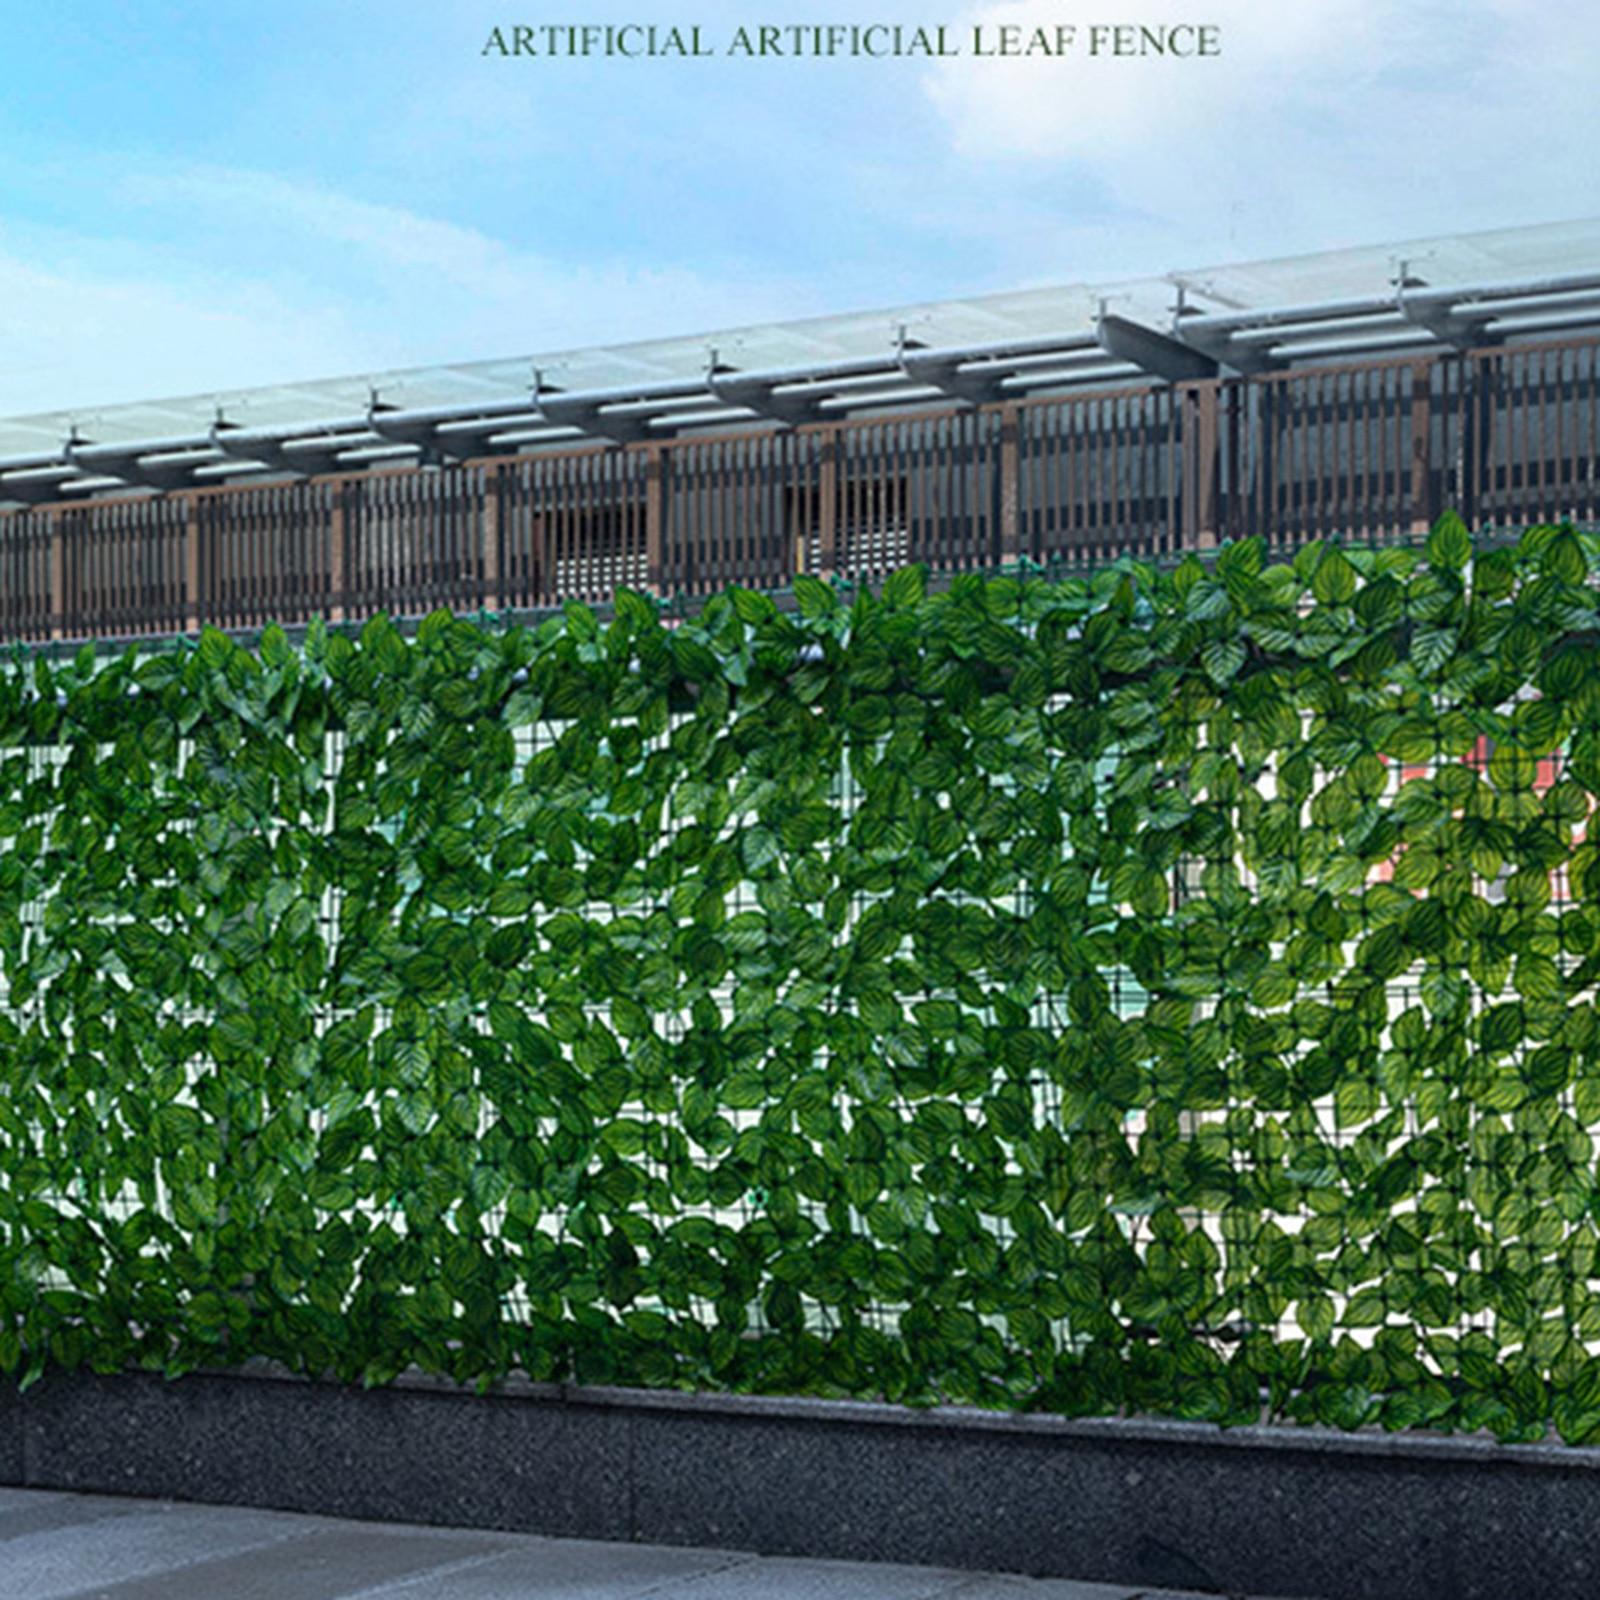 Trellis Privacy Fence Screen Outdoor Backyard Screening Panel Decor Ornament